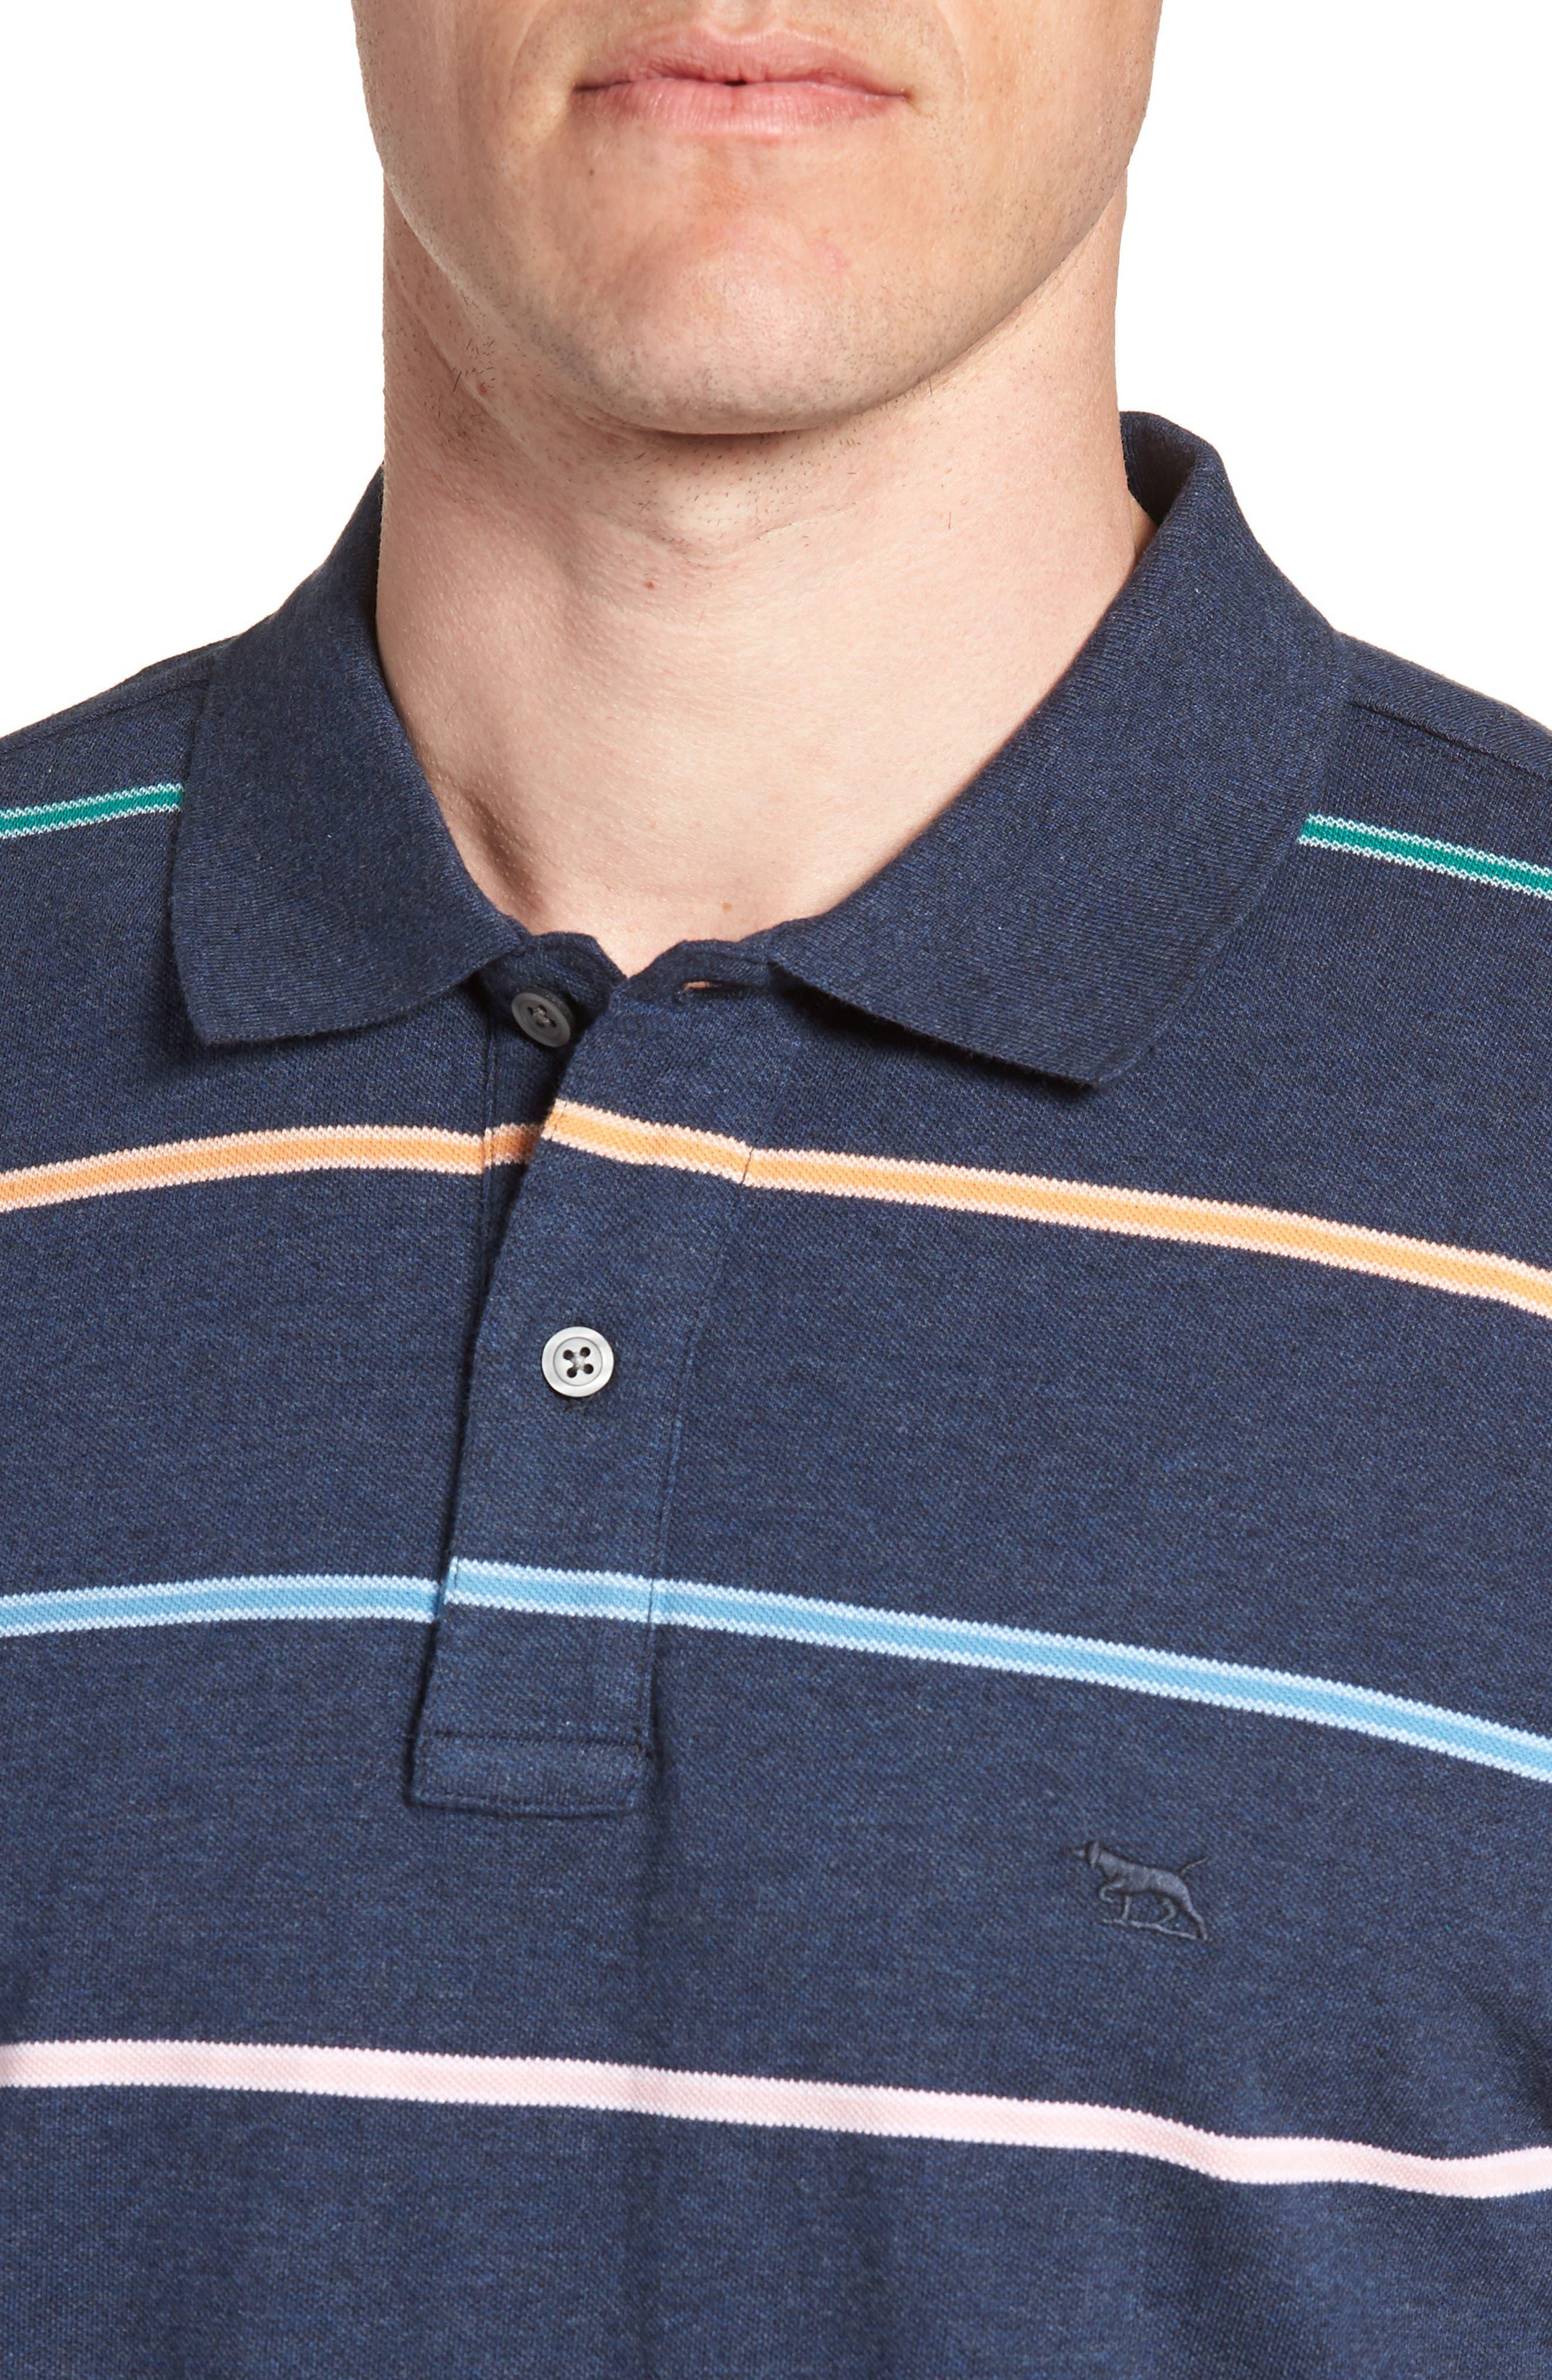 Caberfield Regular Fit Stripe Polo,                             Alternate thumbnail 4, color,                             Ocean